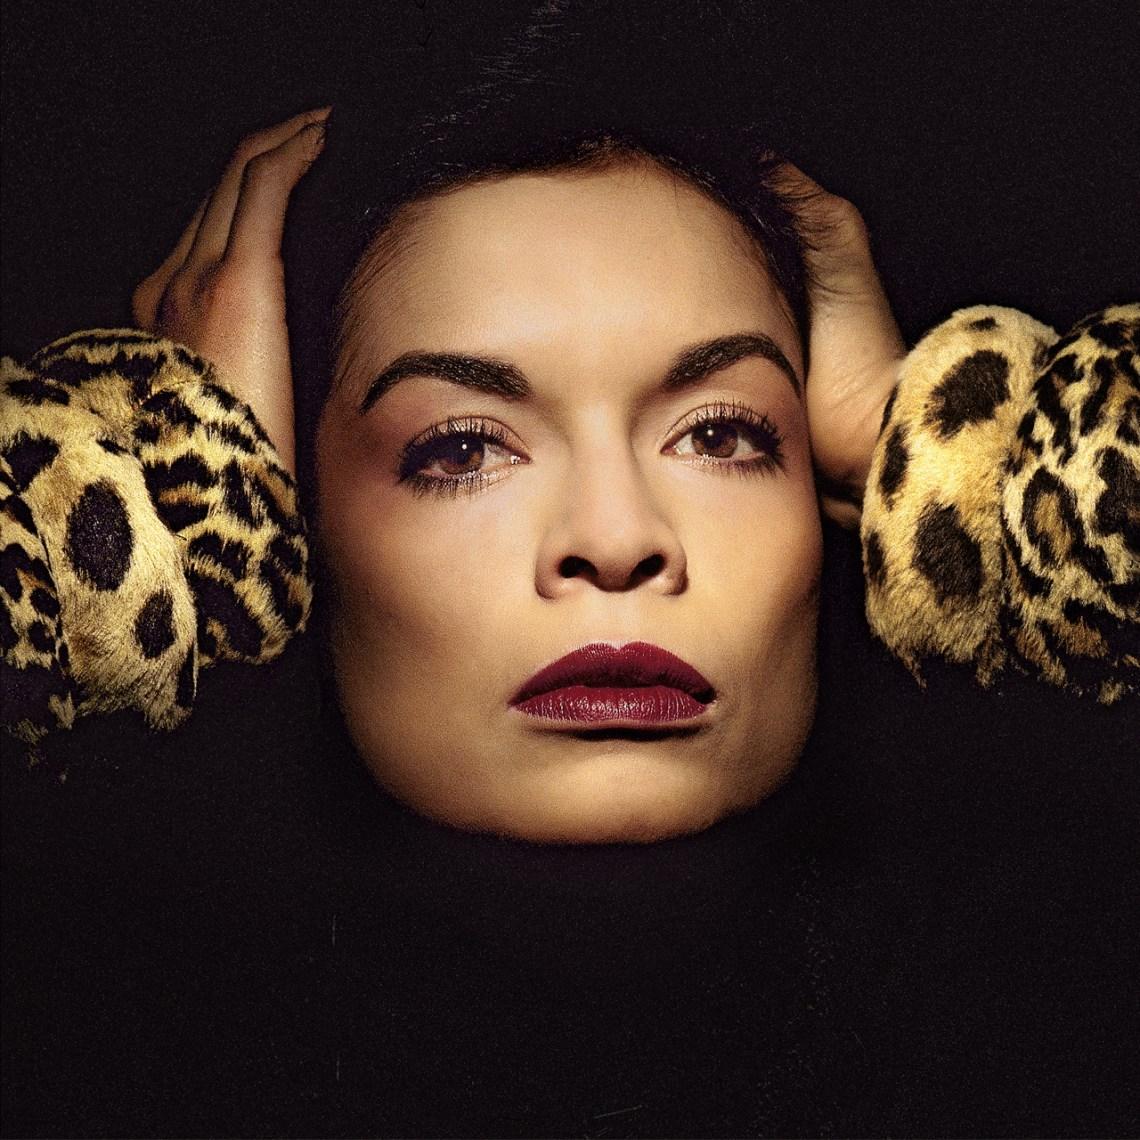 Bianca-Jagger-Boulovard-cover-V2.-Arrowsmith-©.jpg